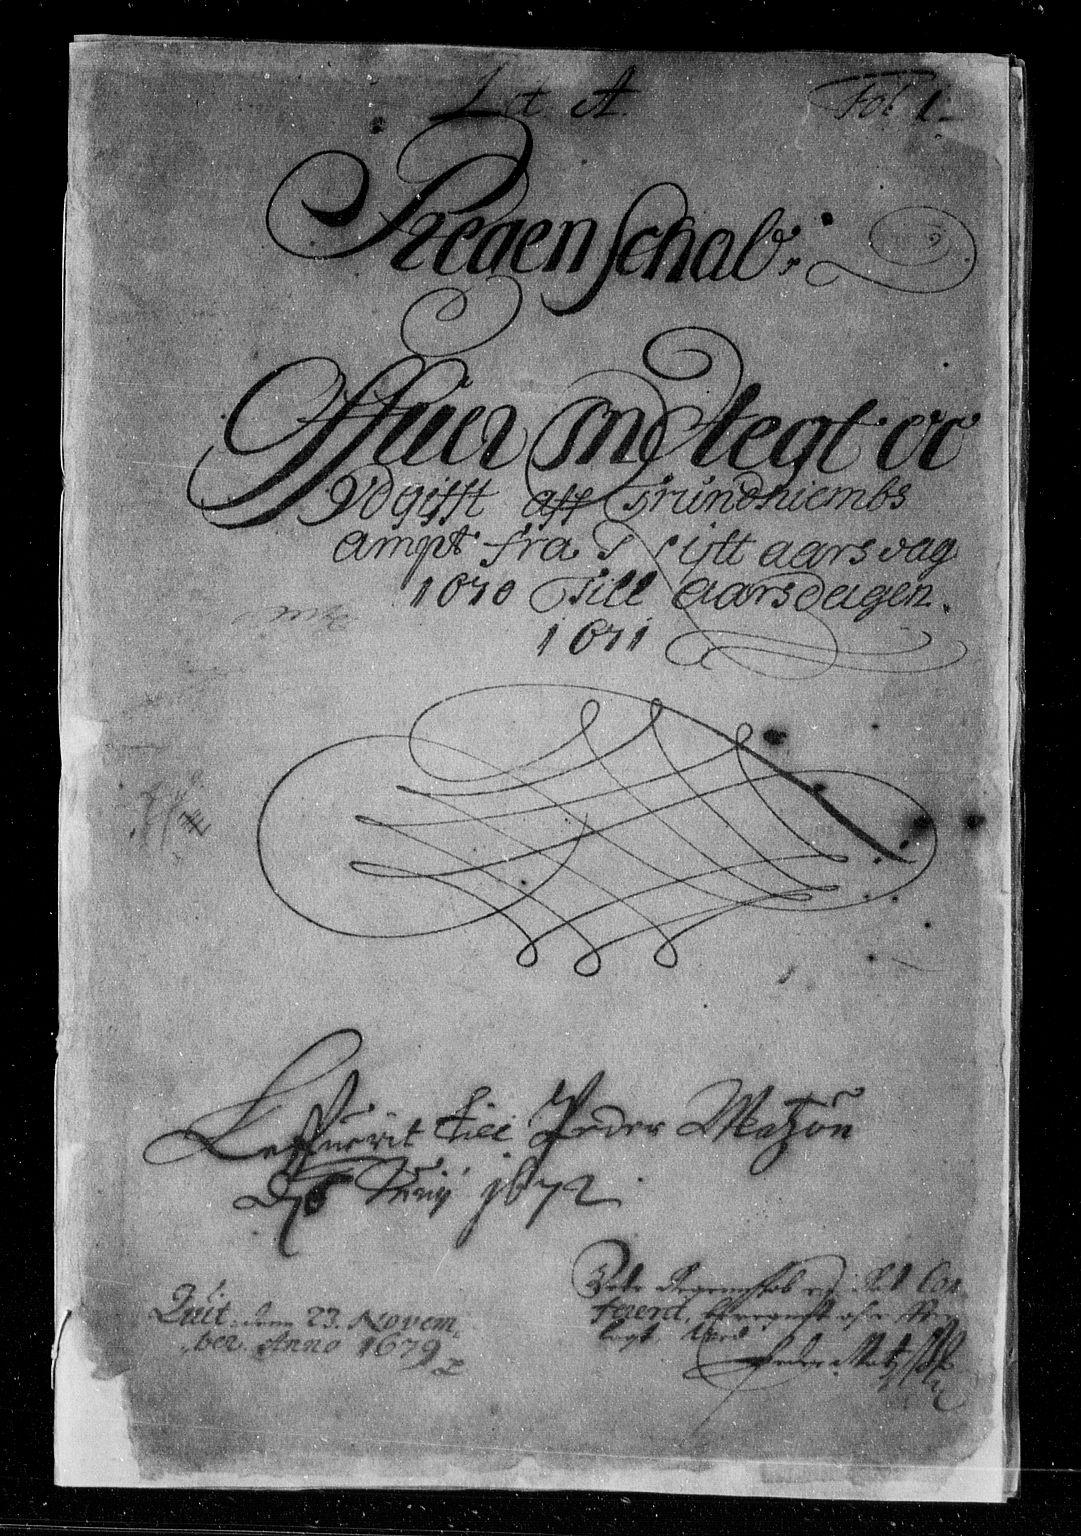 RA, Rentekammeret inntil 1814, Reviderte regnskaper, Stiftamtstueregnskaper, Trondheim stiftamt og Nordland amt, R/Rd/L0029: Trondheim stiftamt, 1670